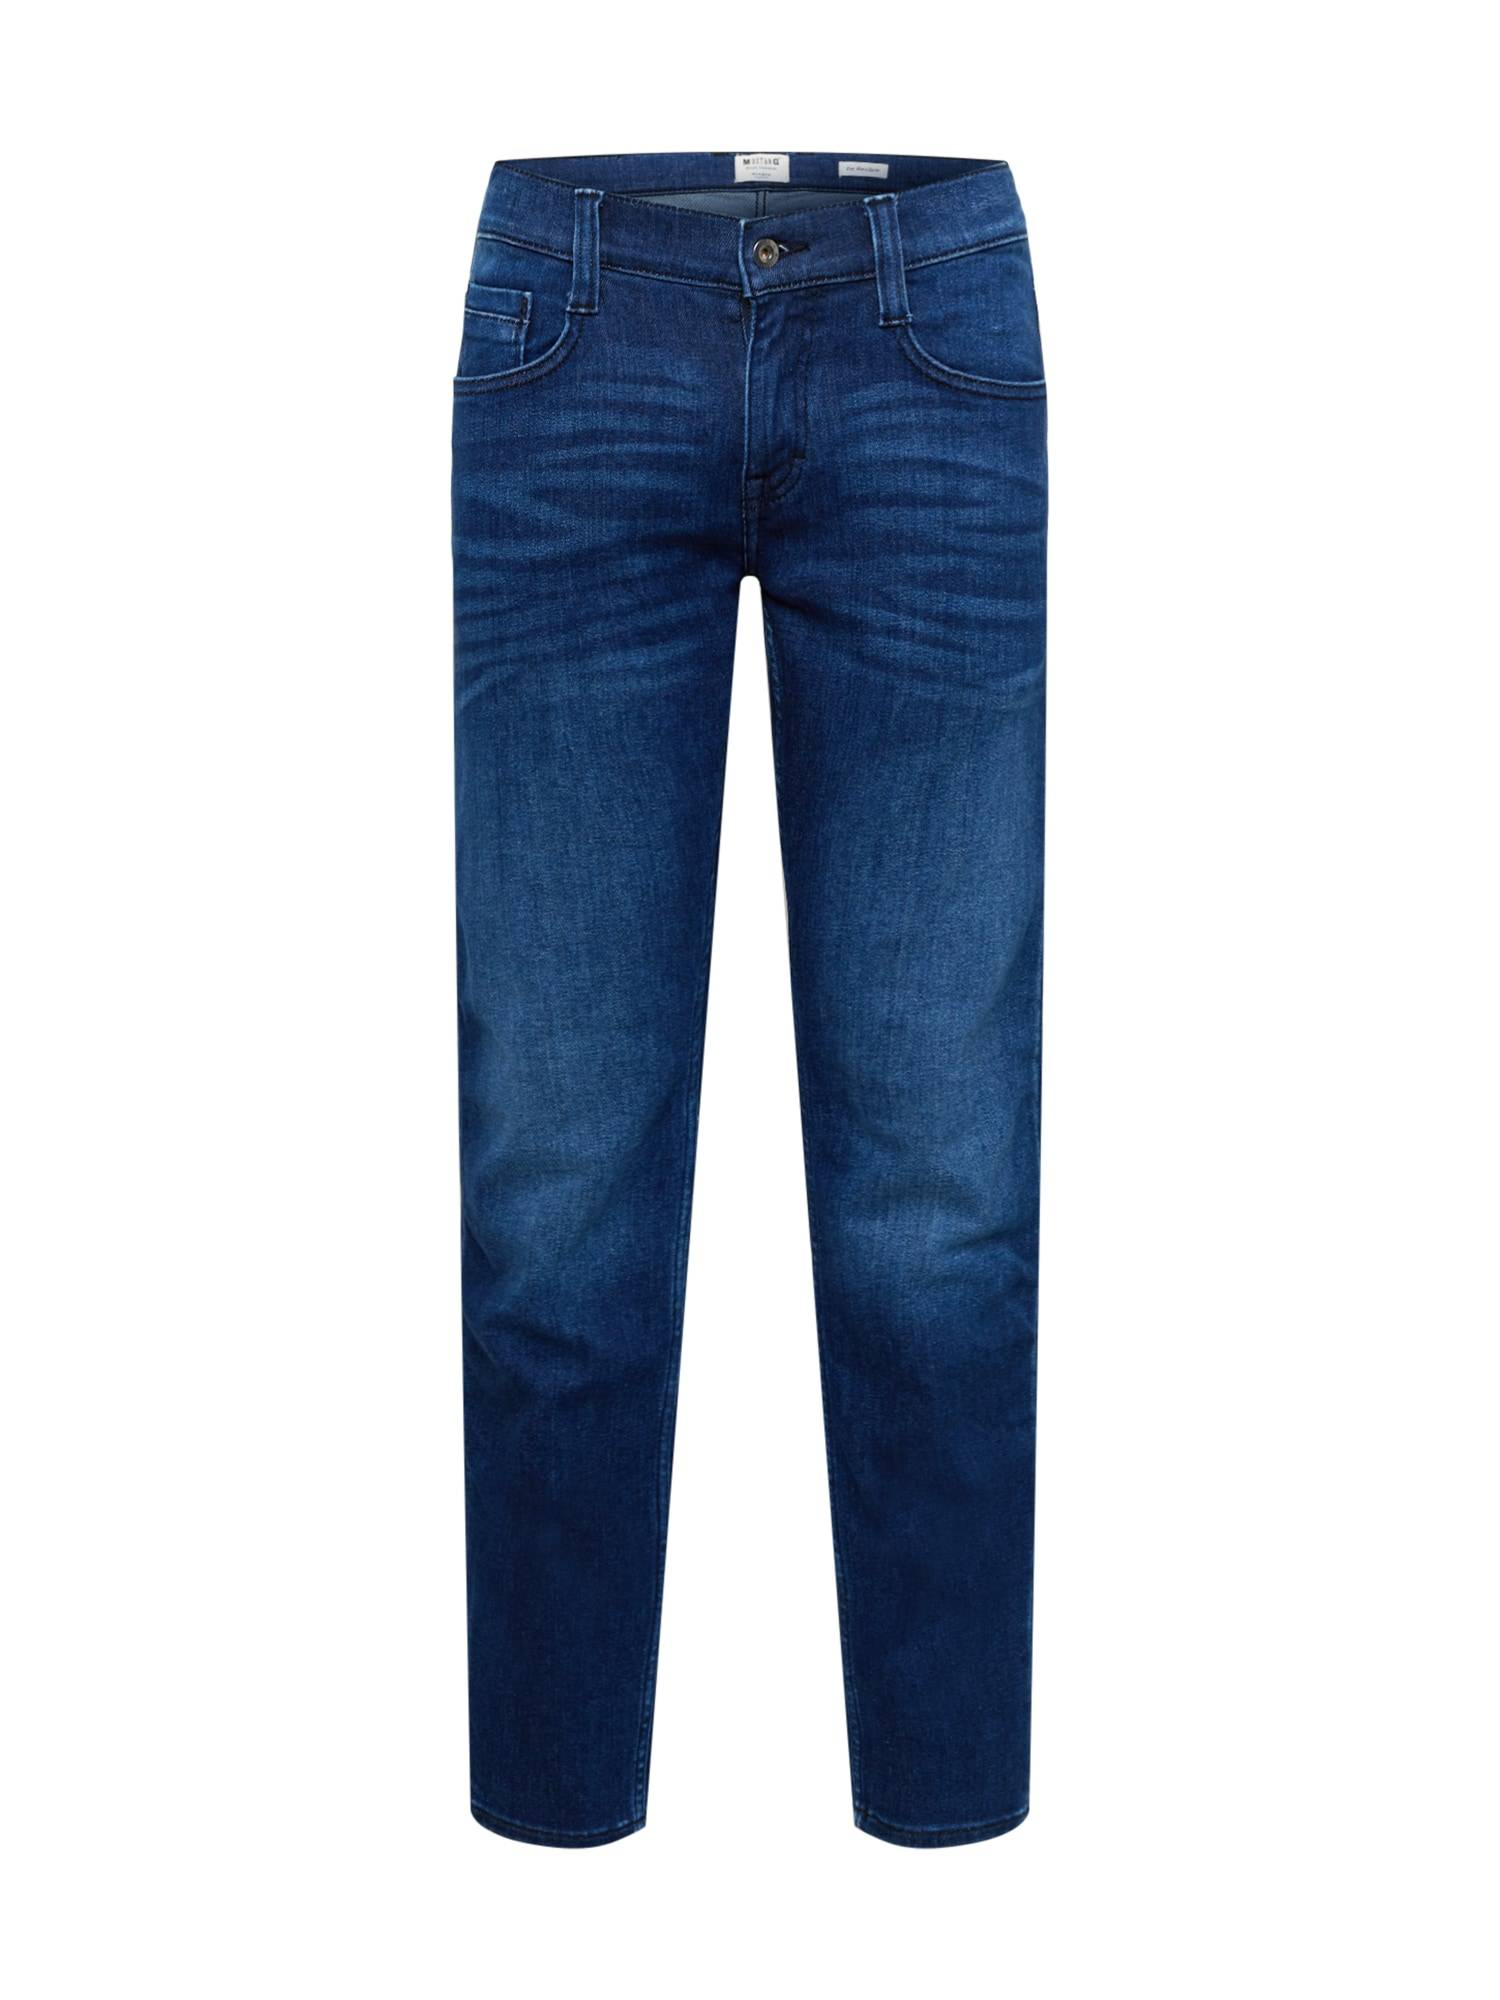 MUSTANG Jean 'Oregon'  - Bleu - Taille: 34 - male